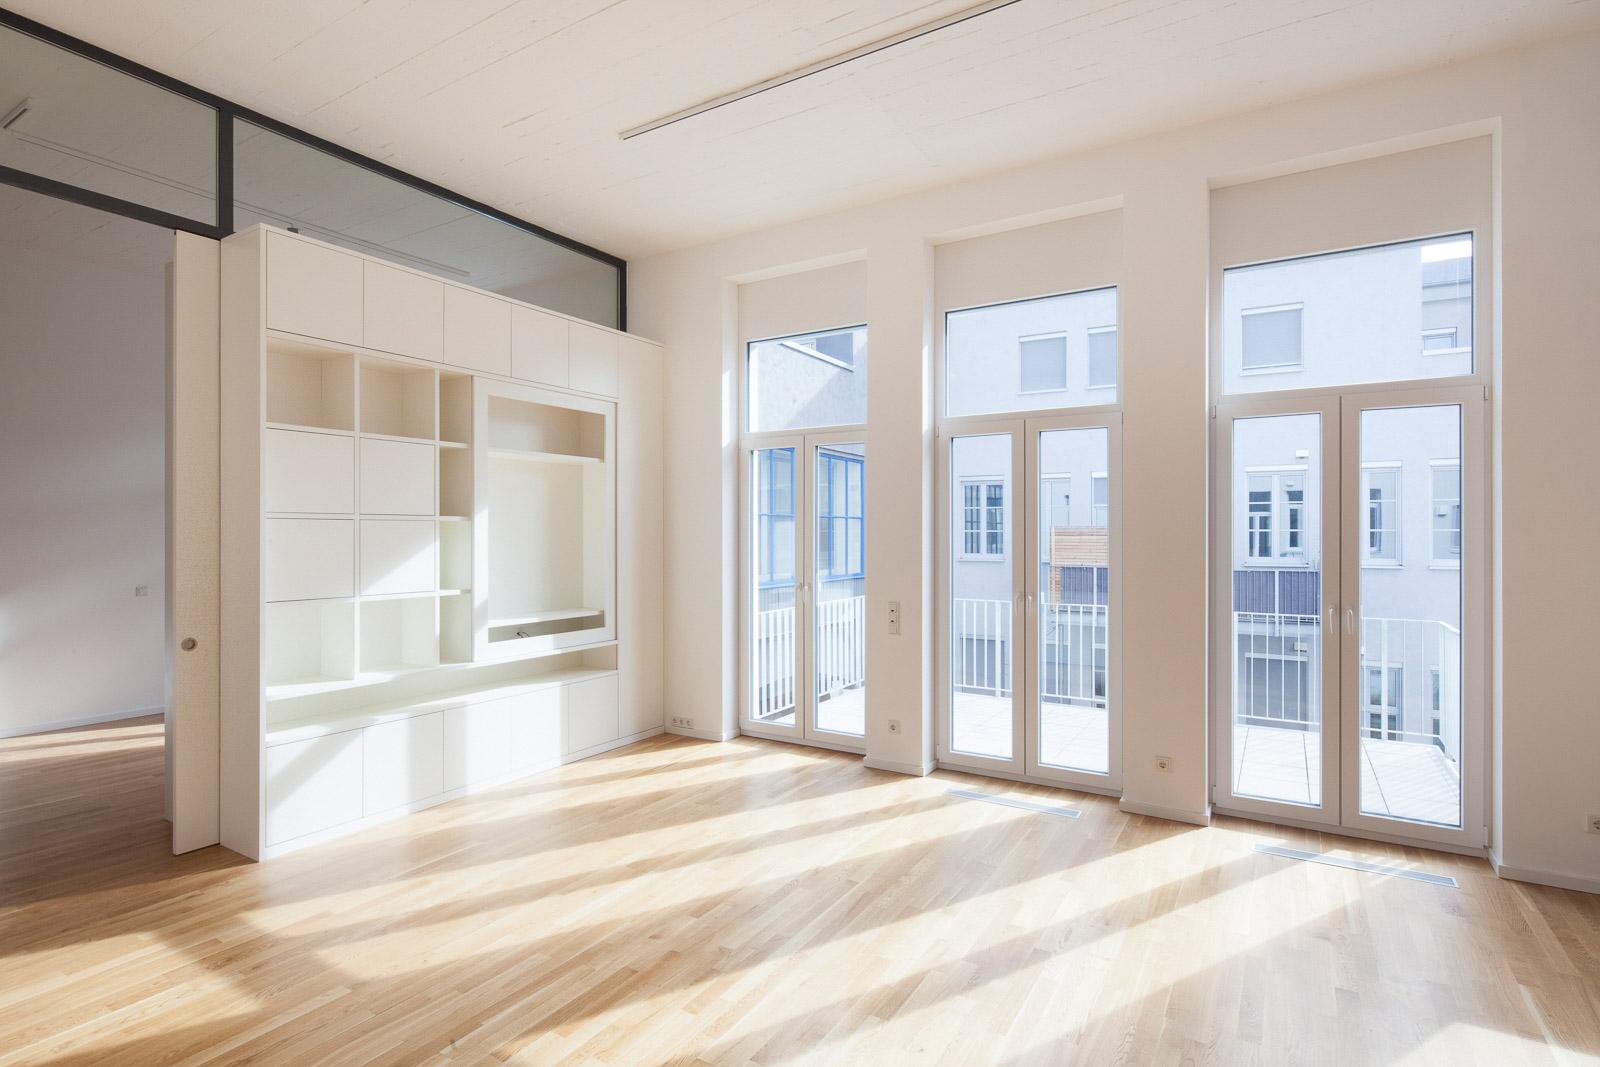 Bobinet Halle 5 - Innenraum Raumteiler